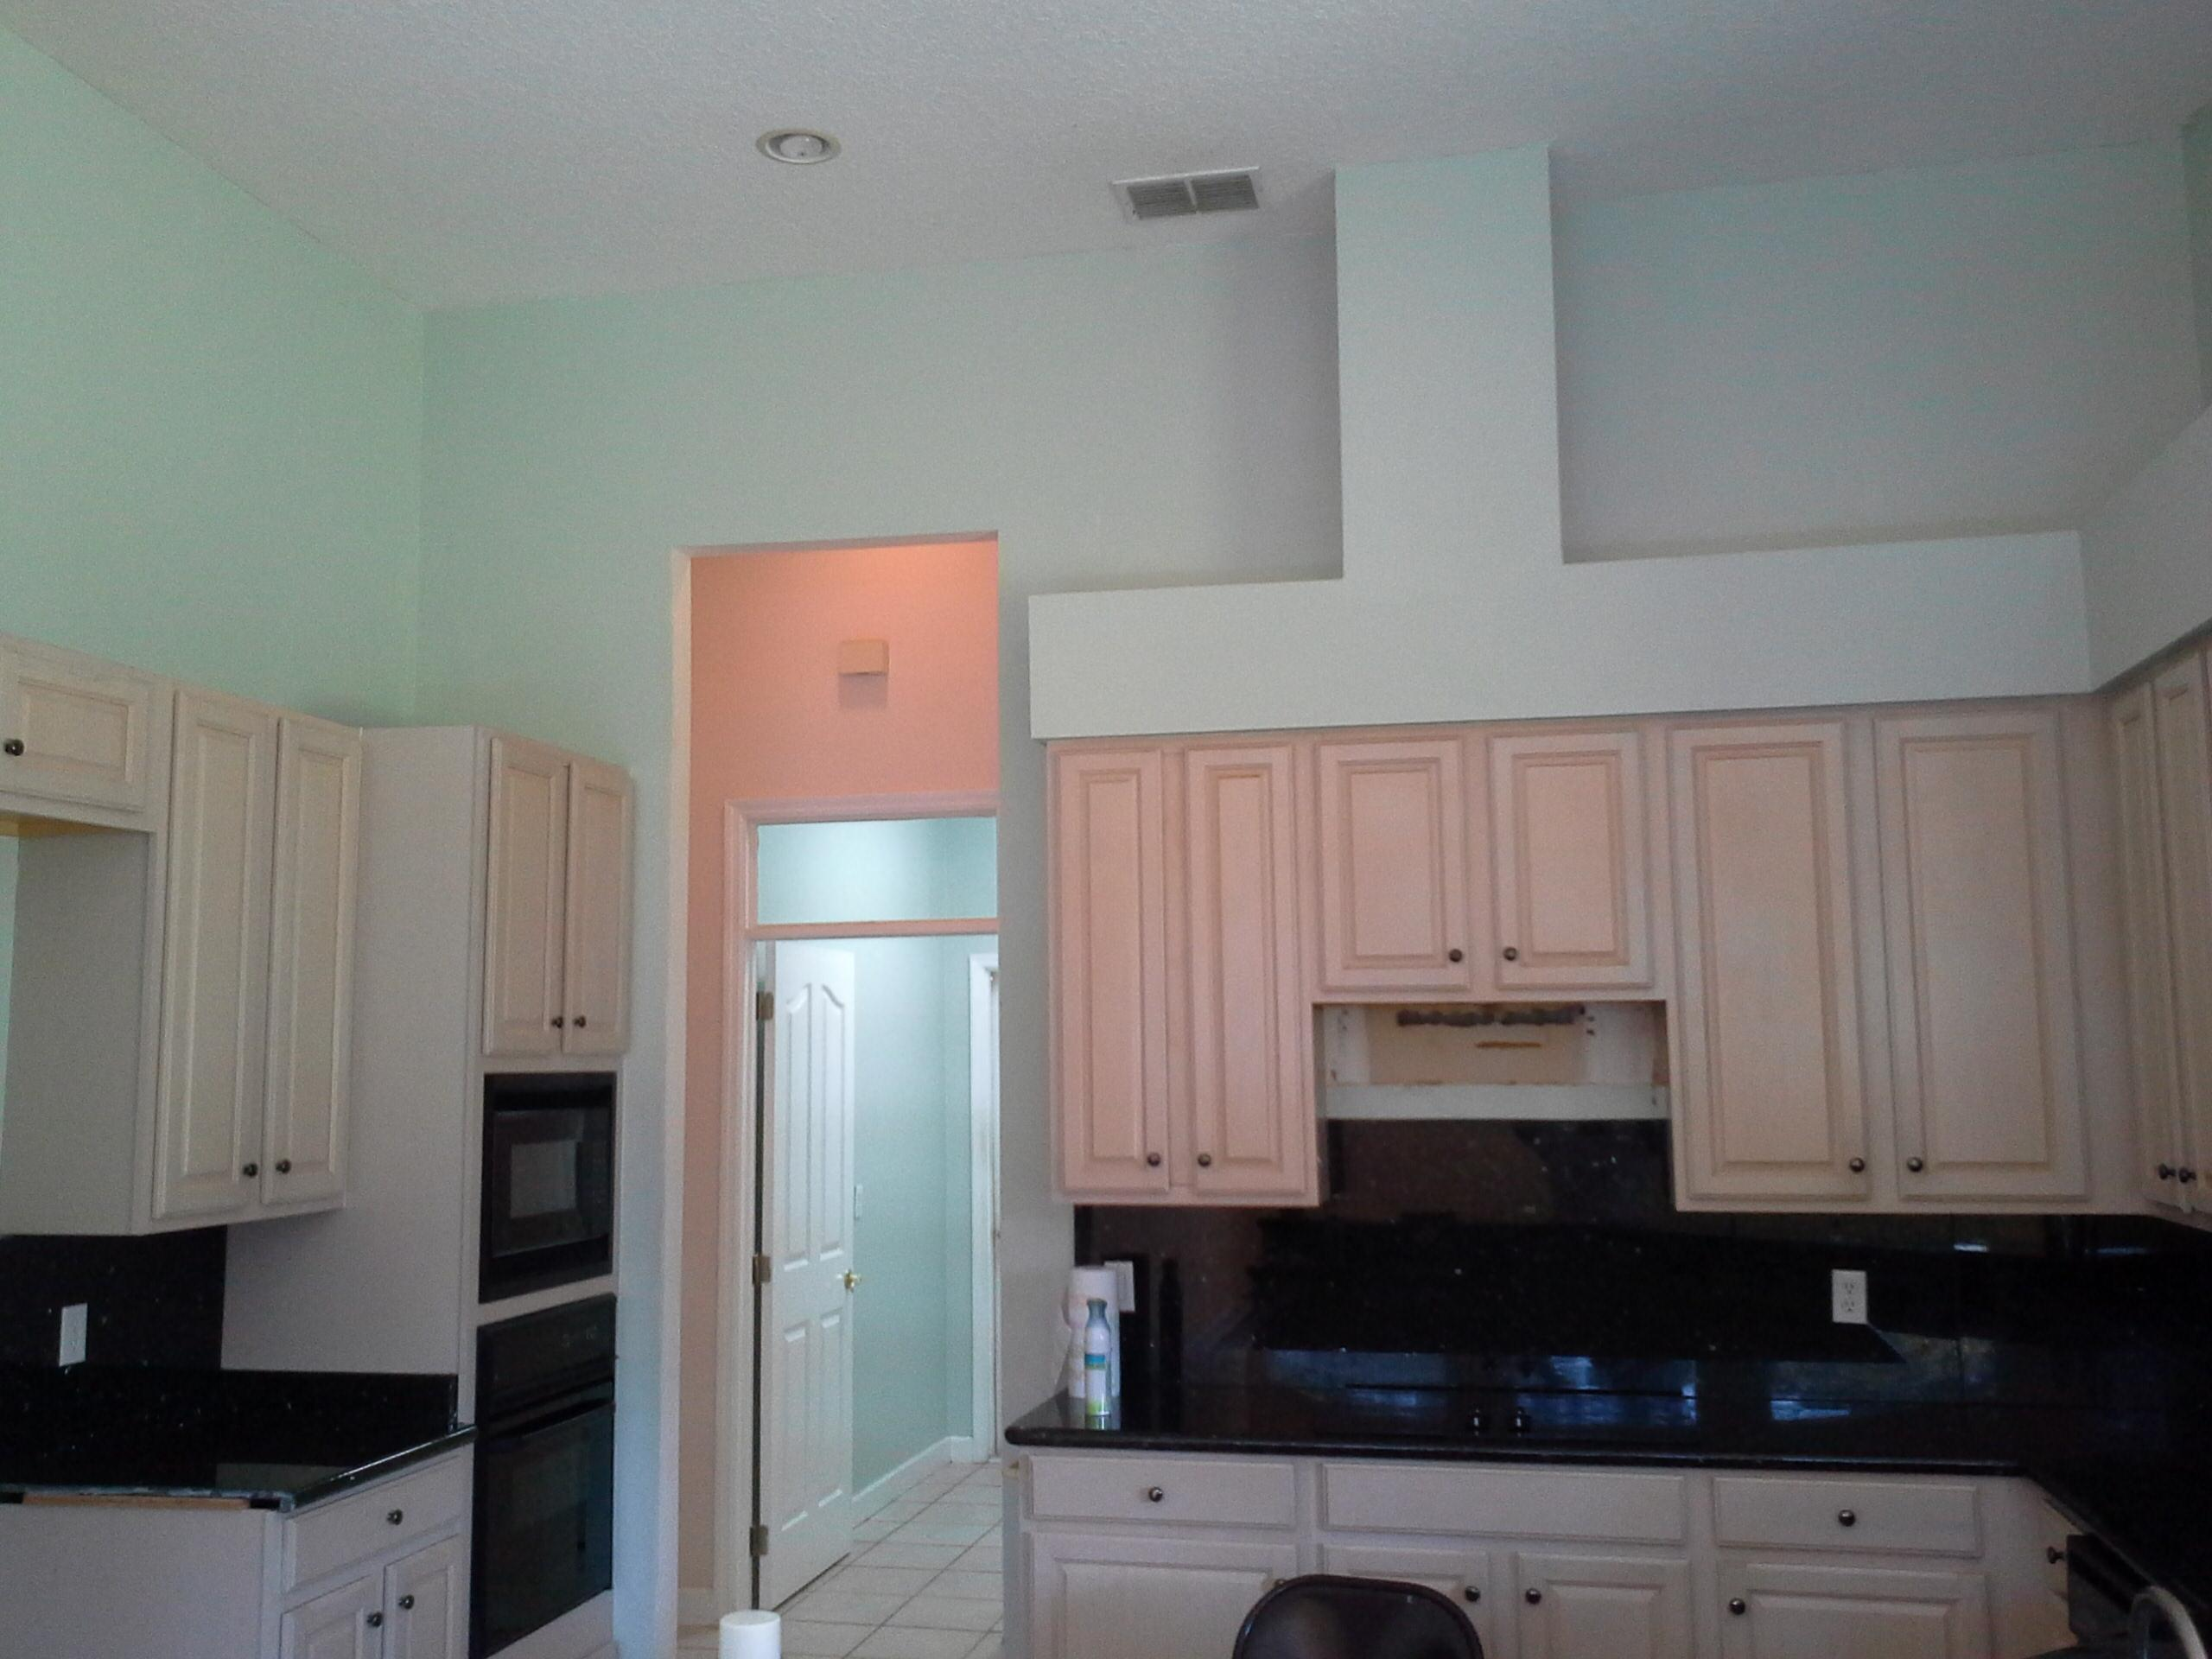 Top Notch Cleaning & Maintenance, LLC